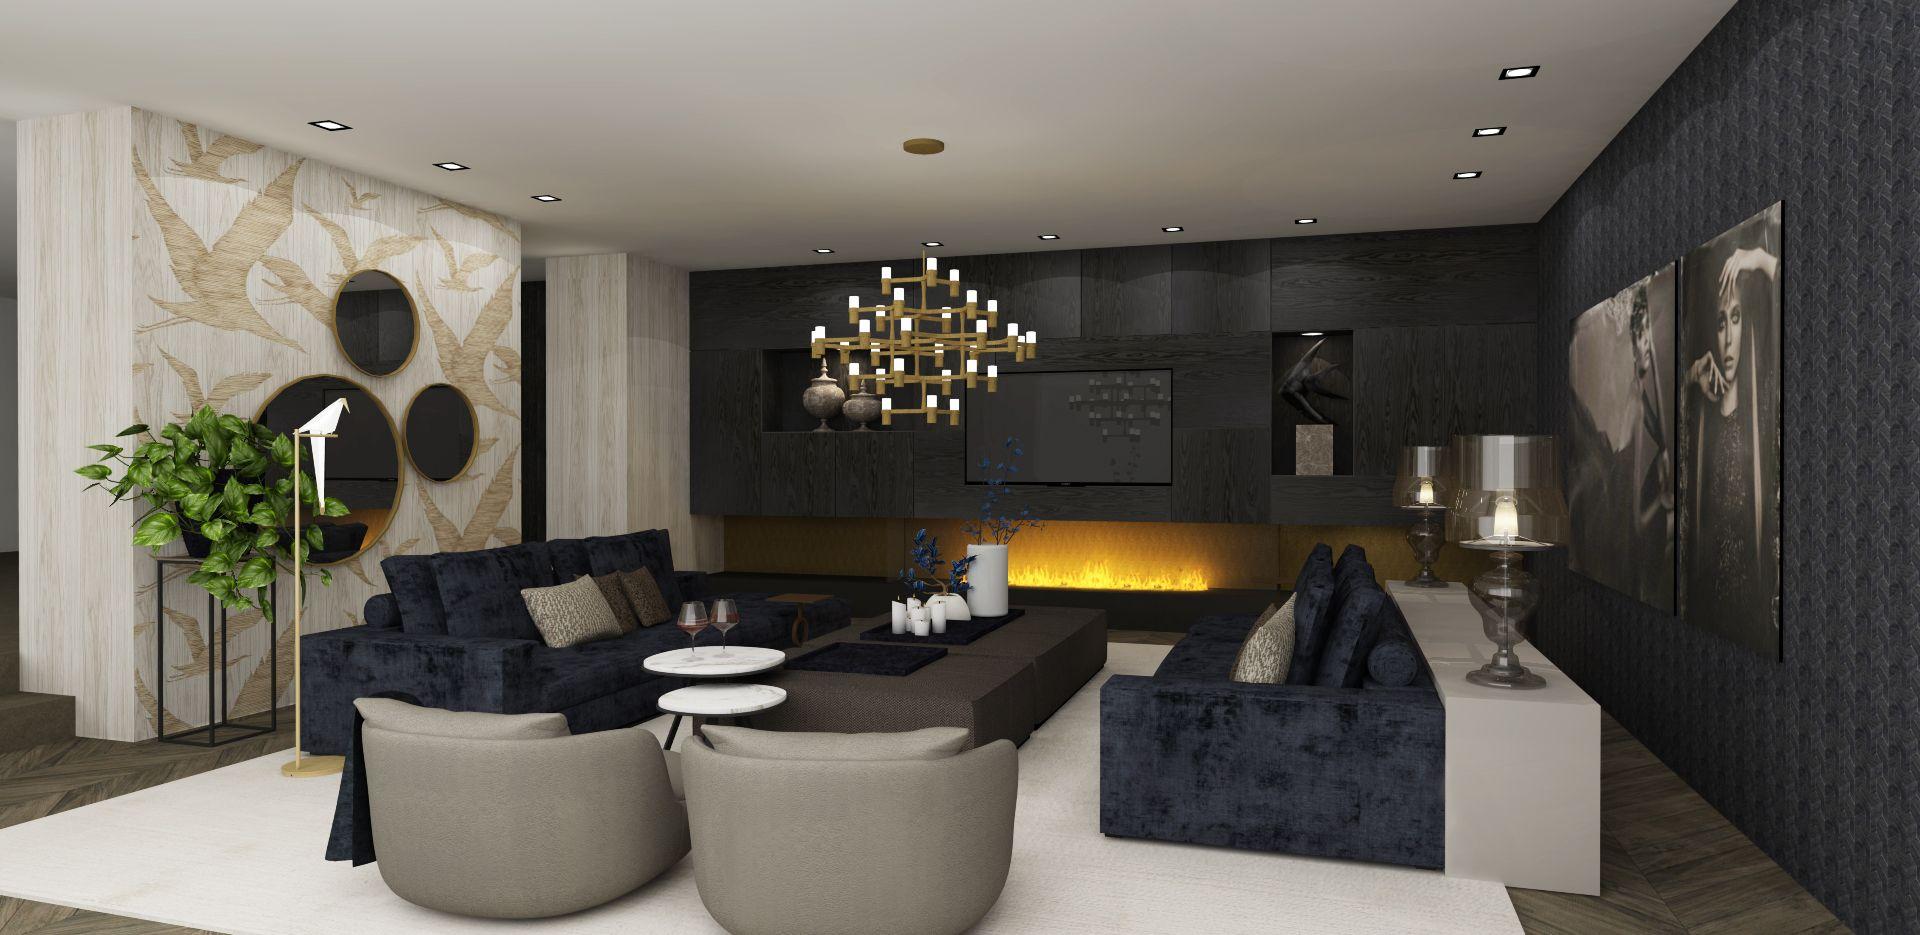 choc studio - modern chic interiors - woonkamer - openhaarden ...